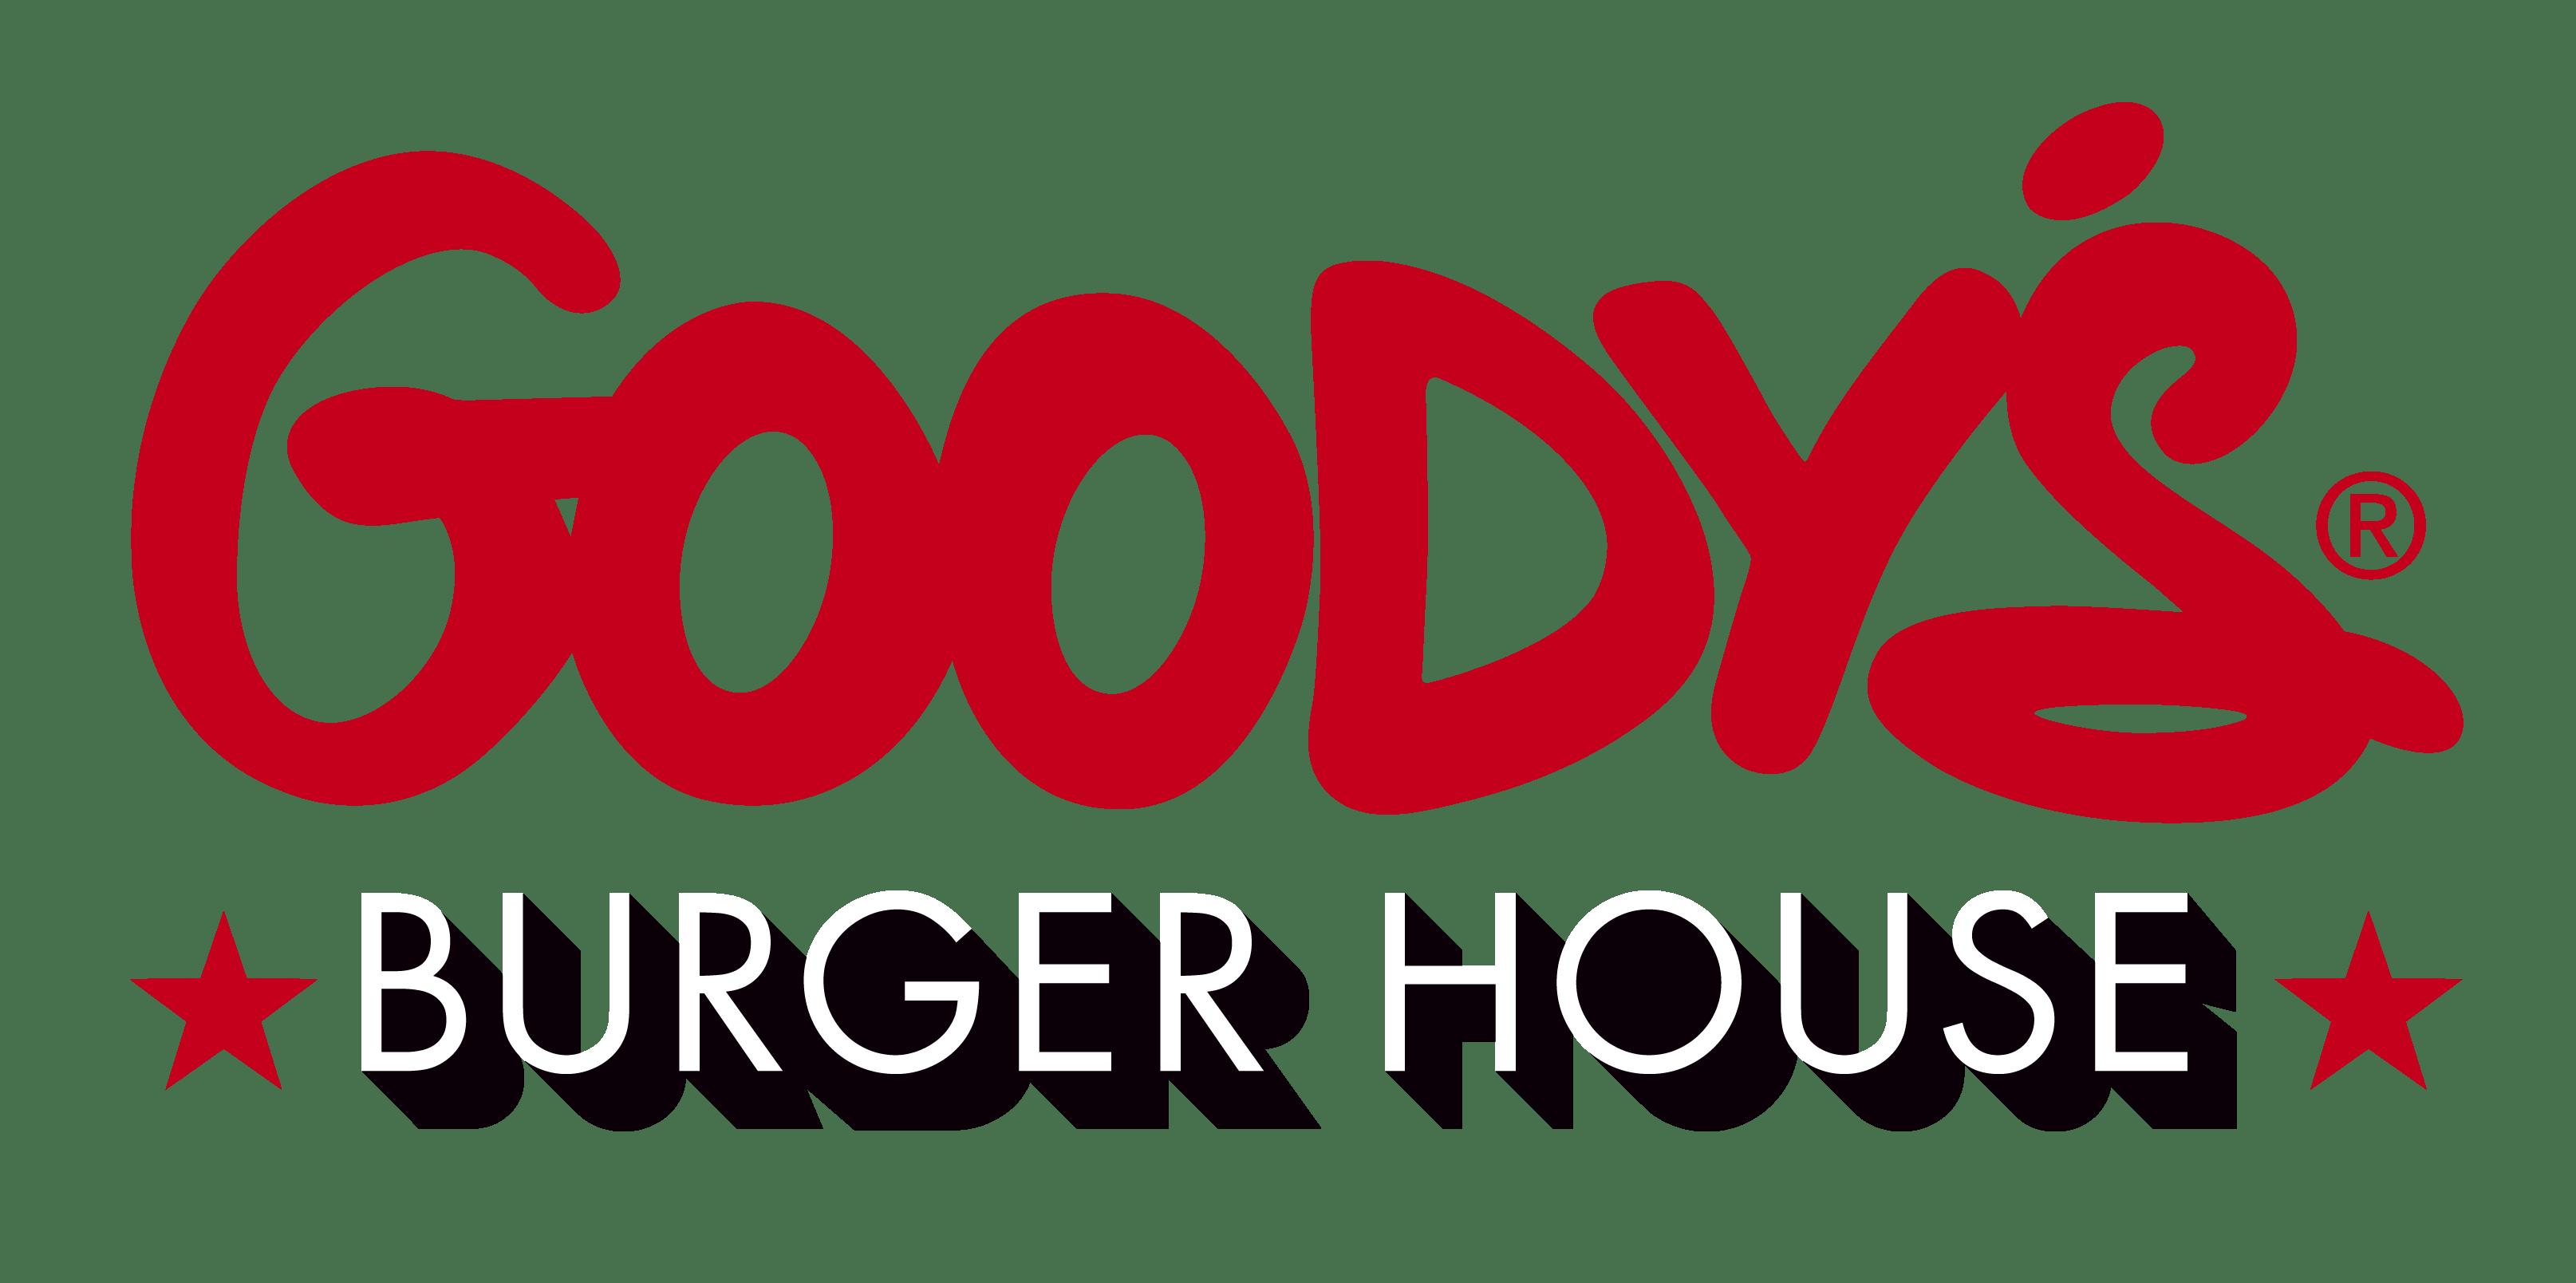 's_Burger_House_logo